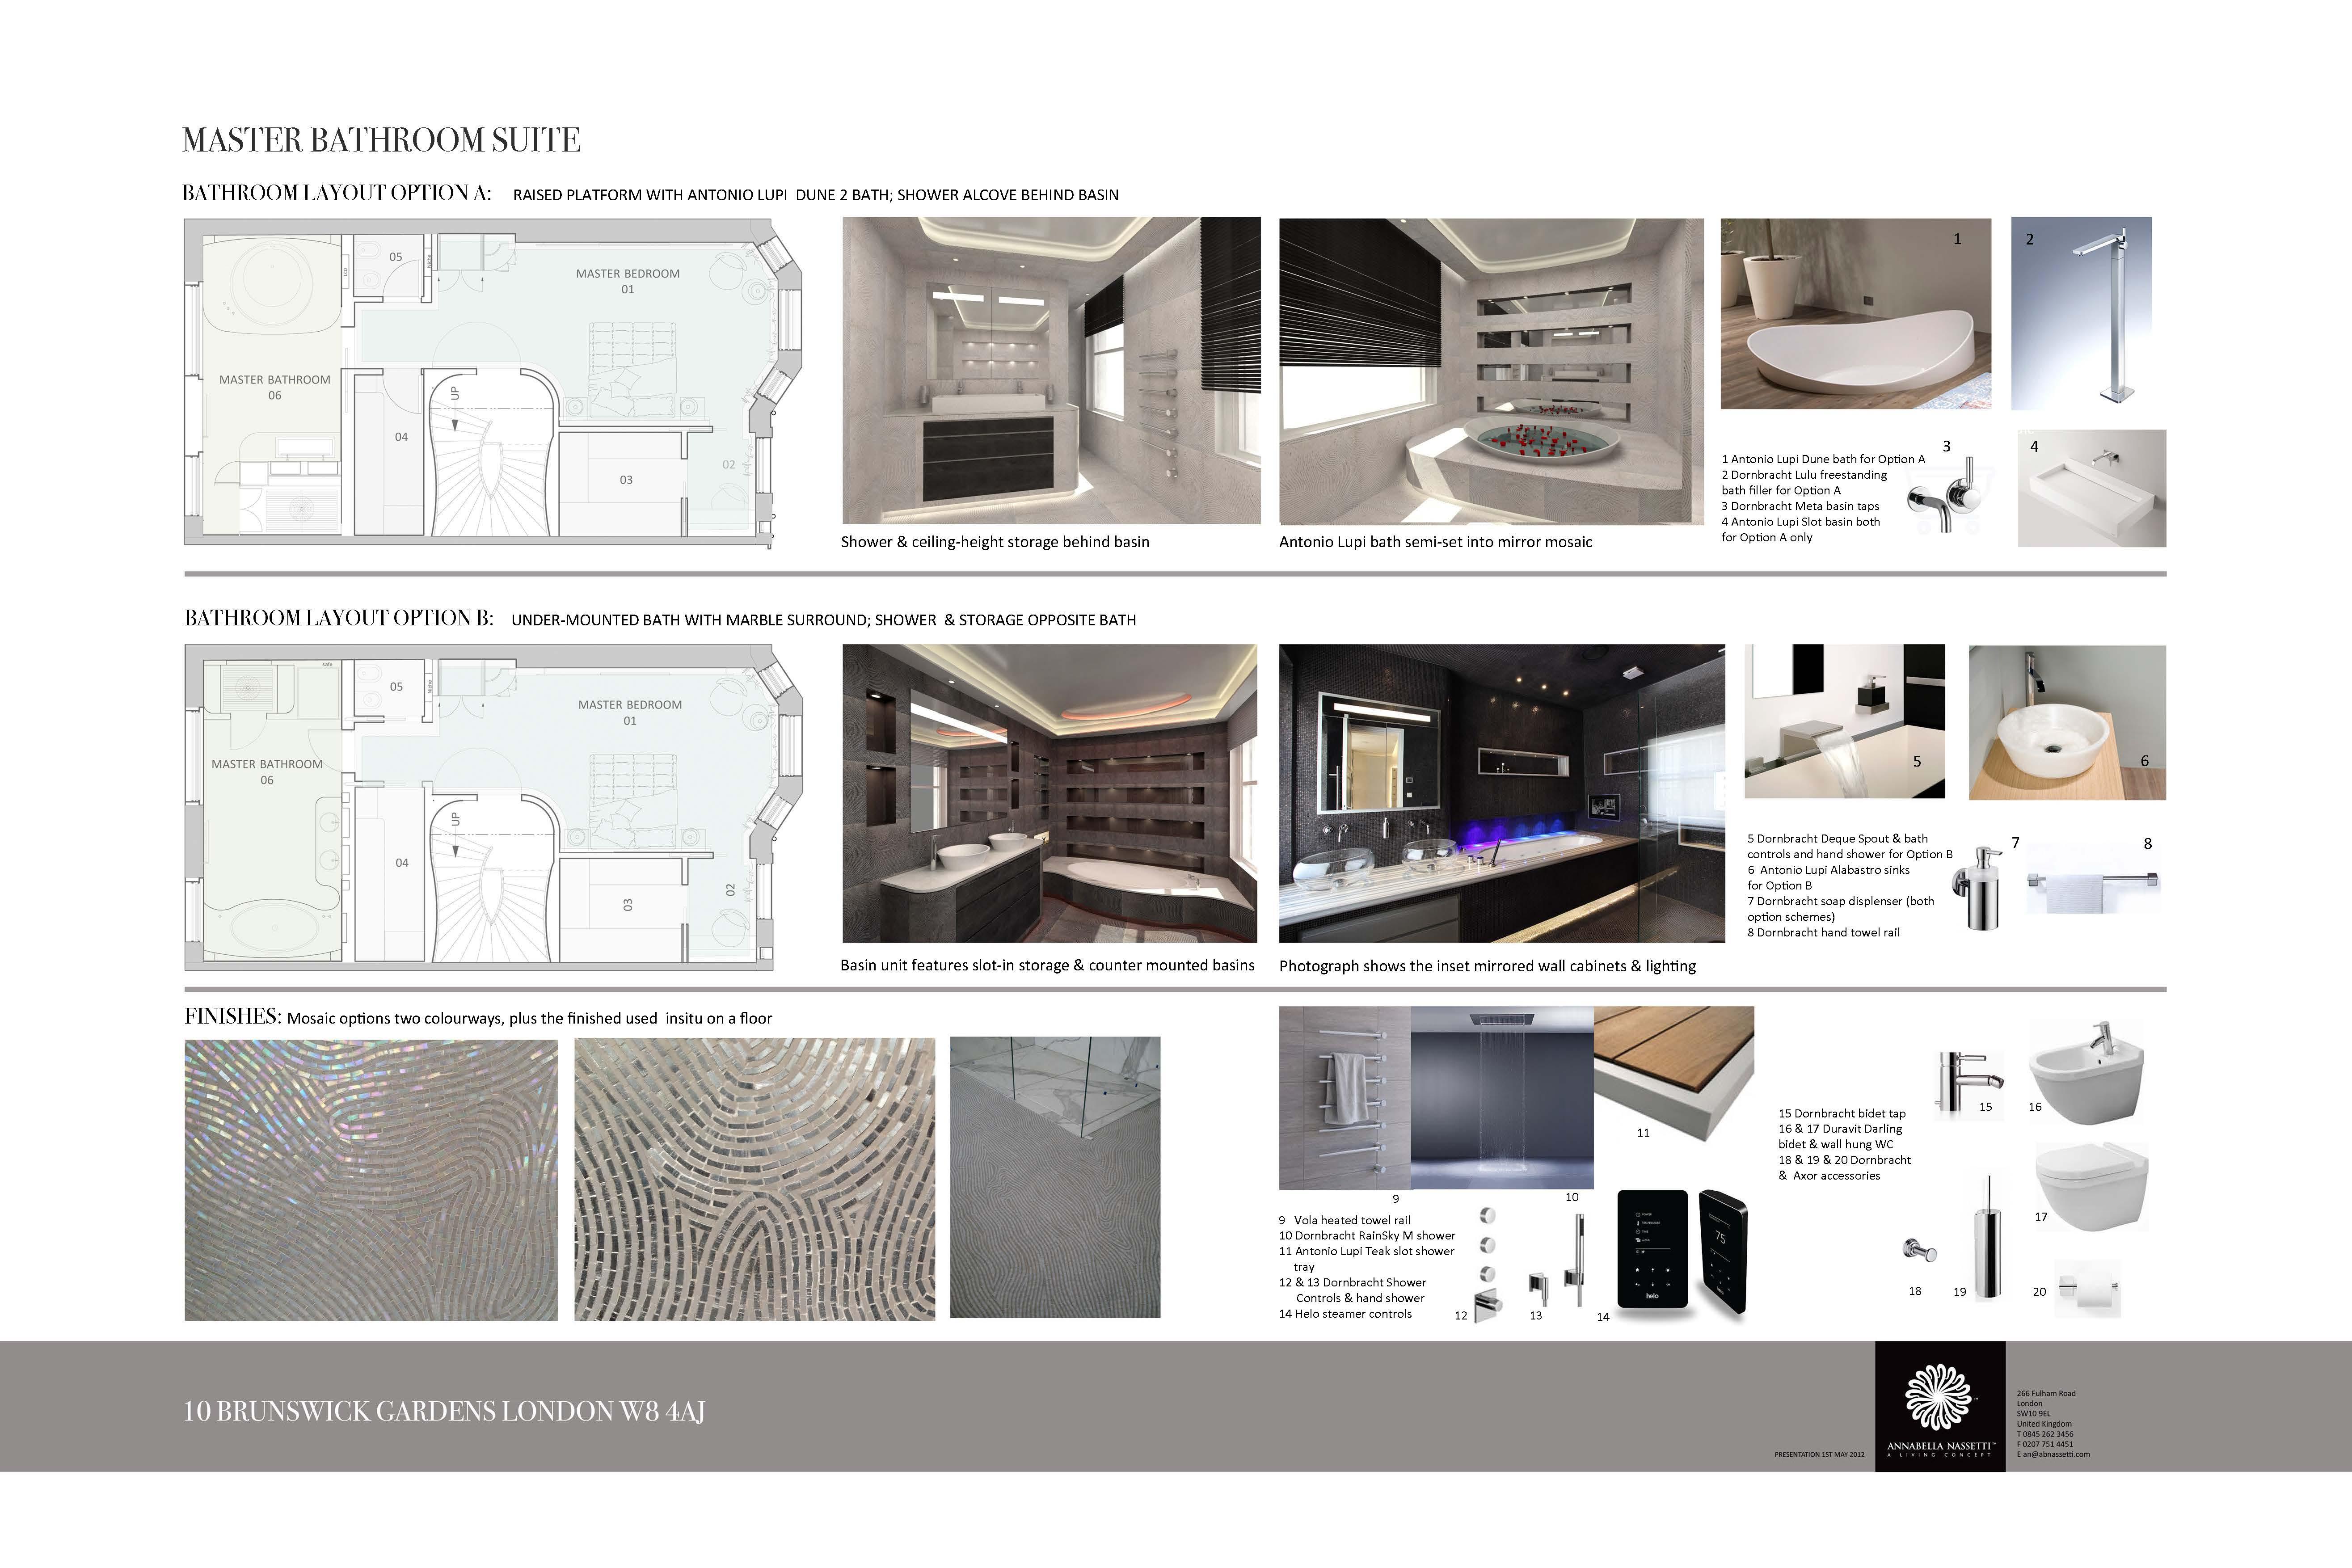 Design Proposal For Bathroom Suite